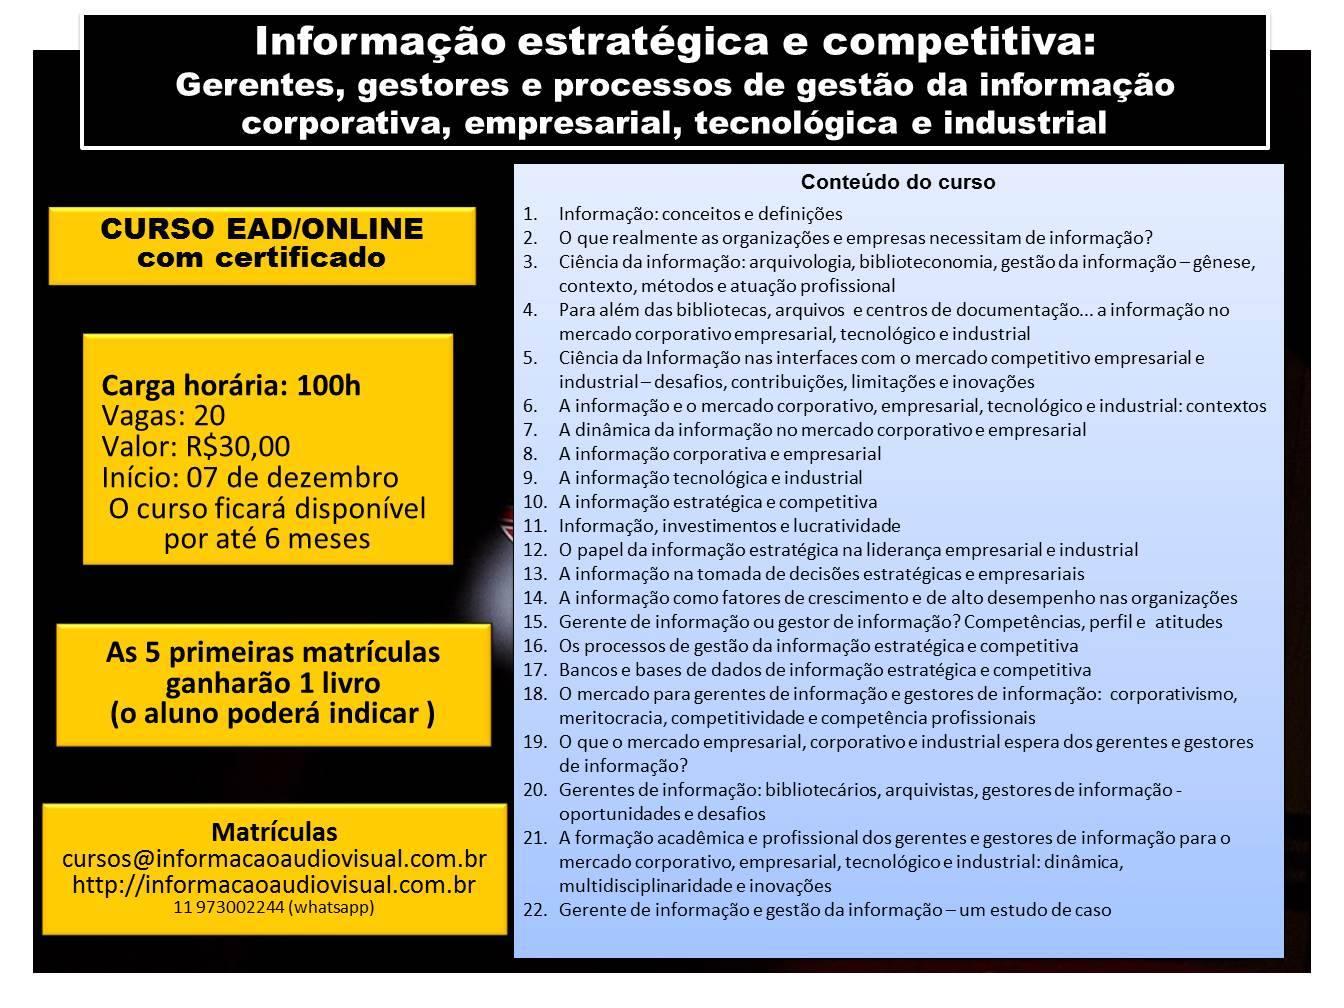 informacao-estrategica-e-competitiva